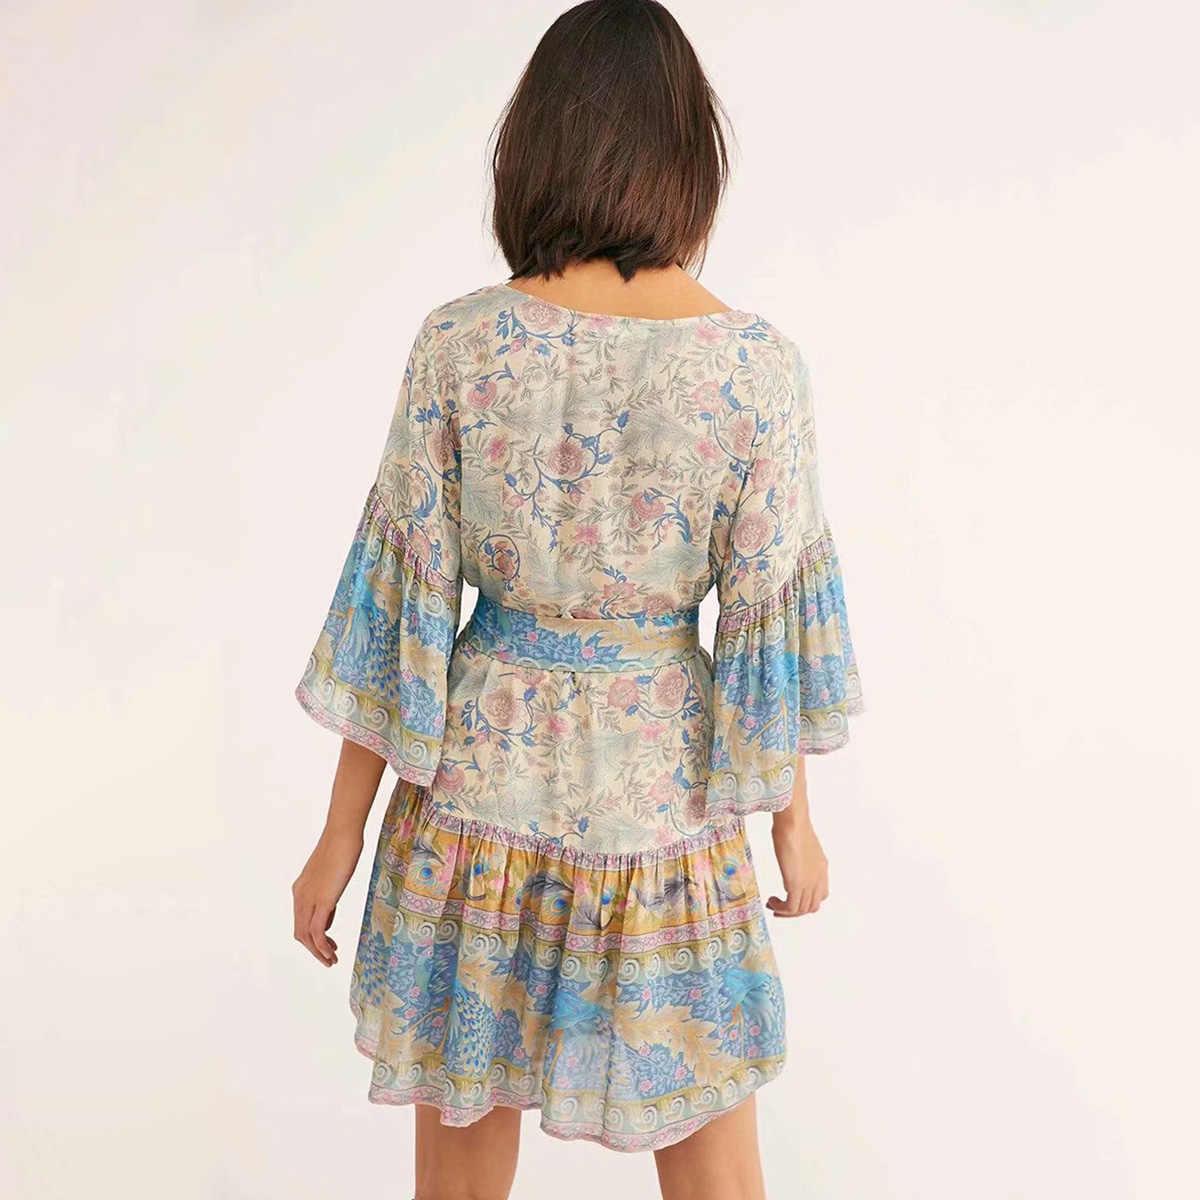 9a80f188f7aa ... Oasis Mini Dress V-Neck Short Sleeve Summer Dresses Boho Beach Floral  Print Dress Casual